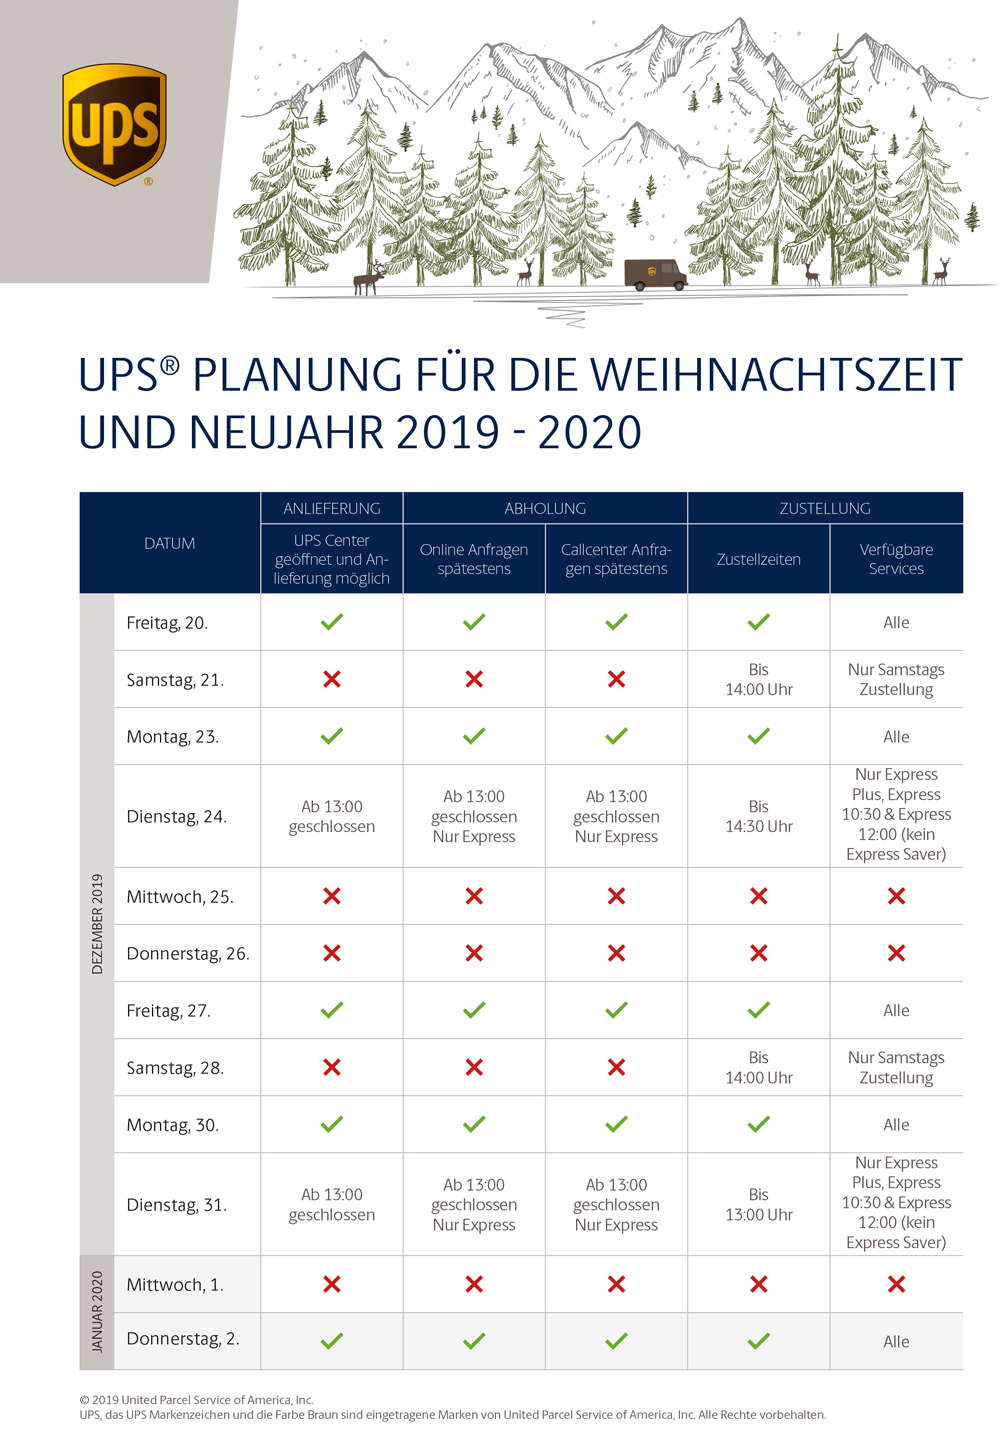 Peak Season Dates